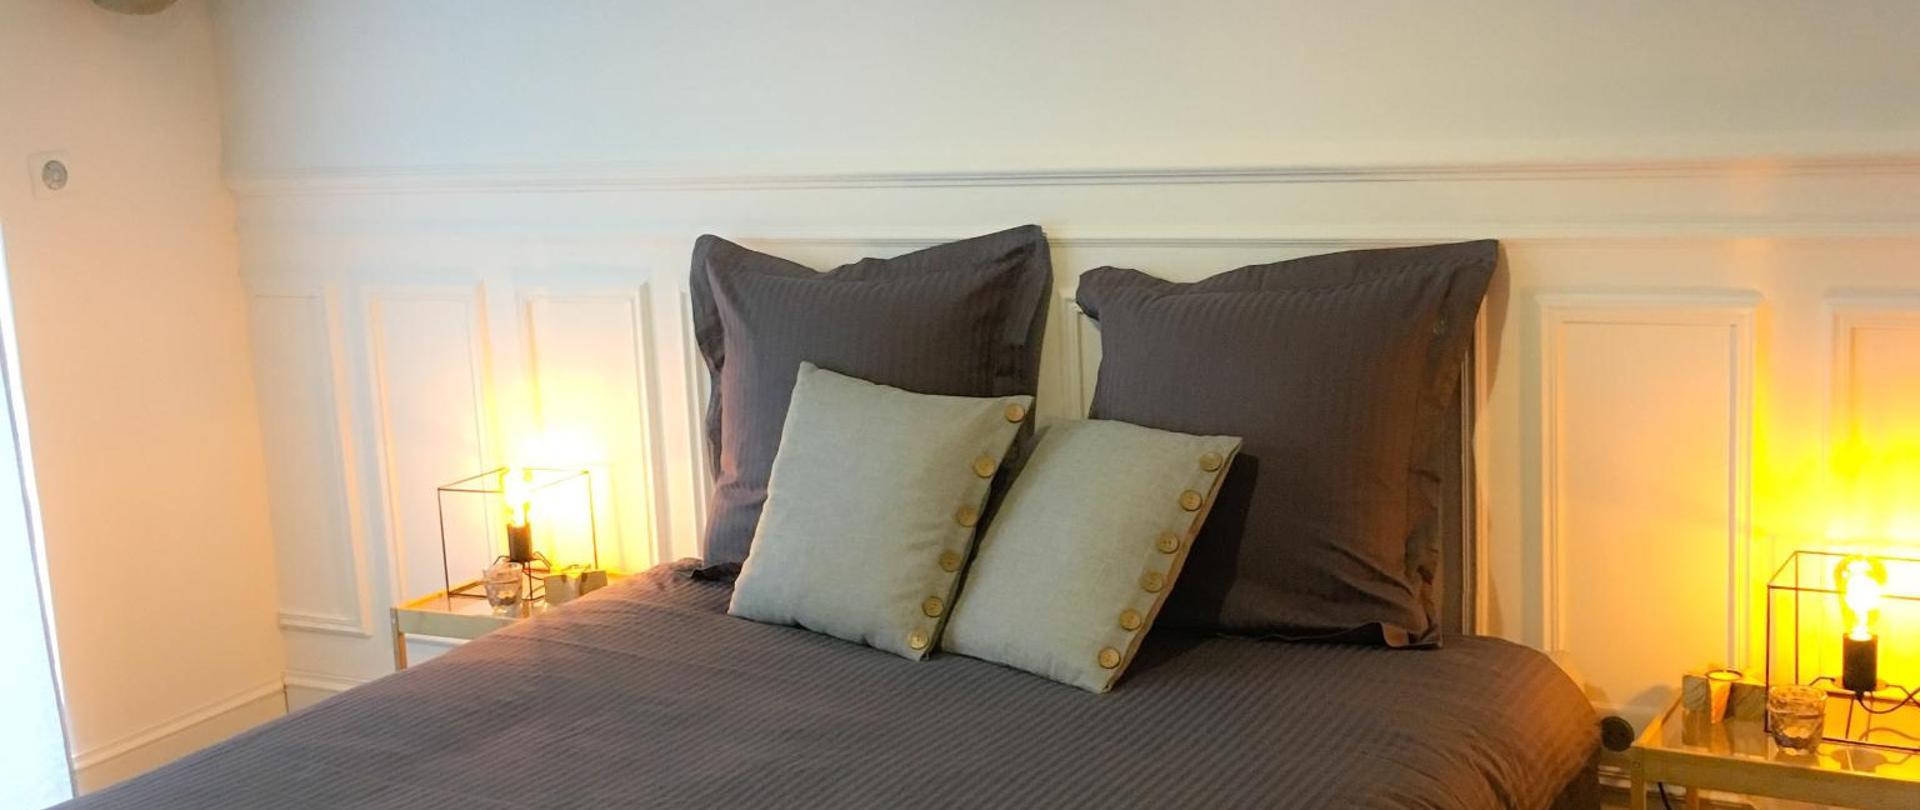 Chambres d'hotes Les Nuits Pastel